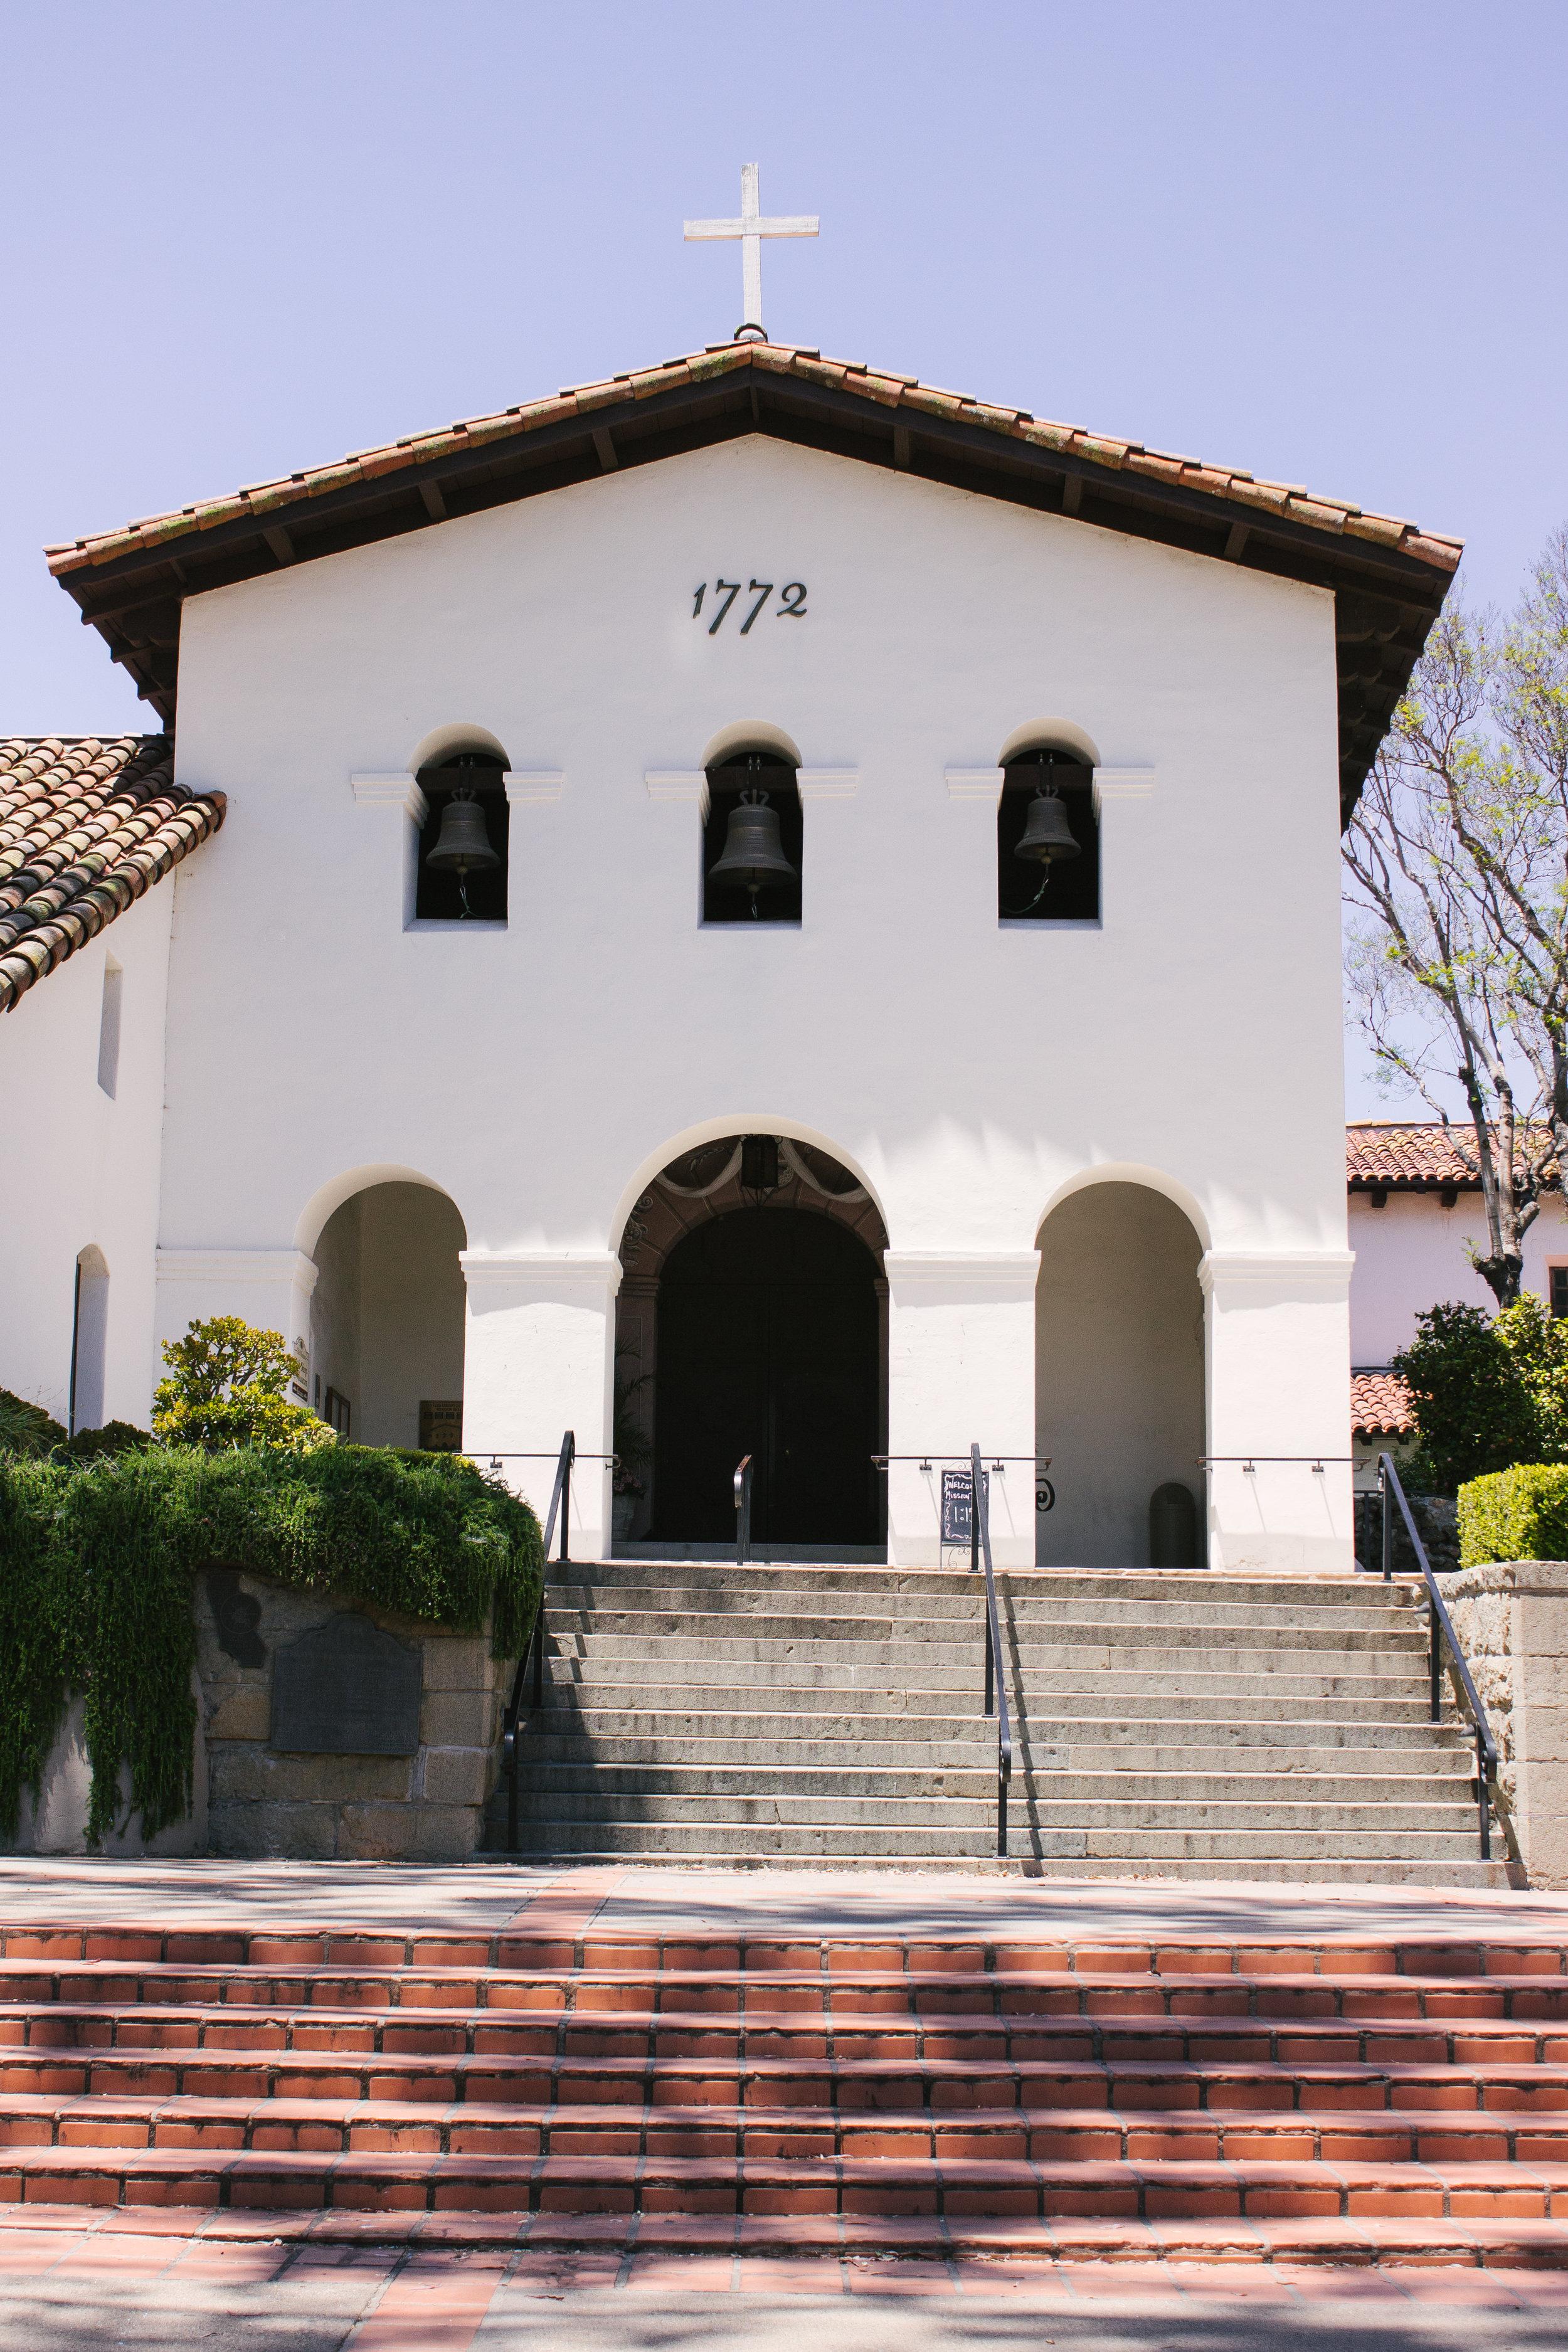 san_luis_obispo_central_coast_california-3.jpg